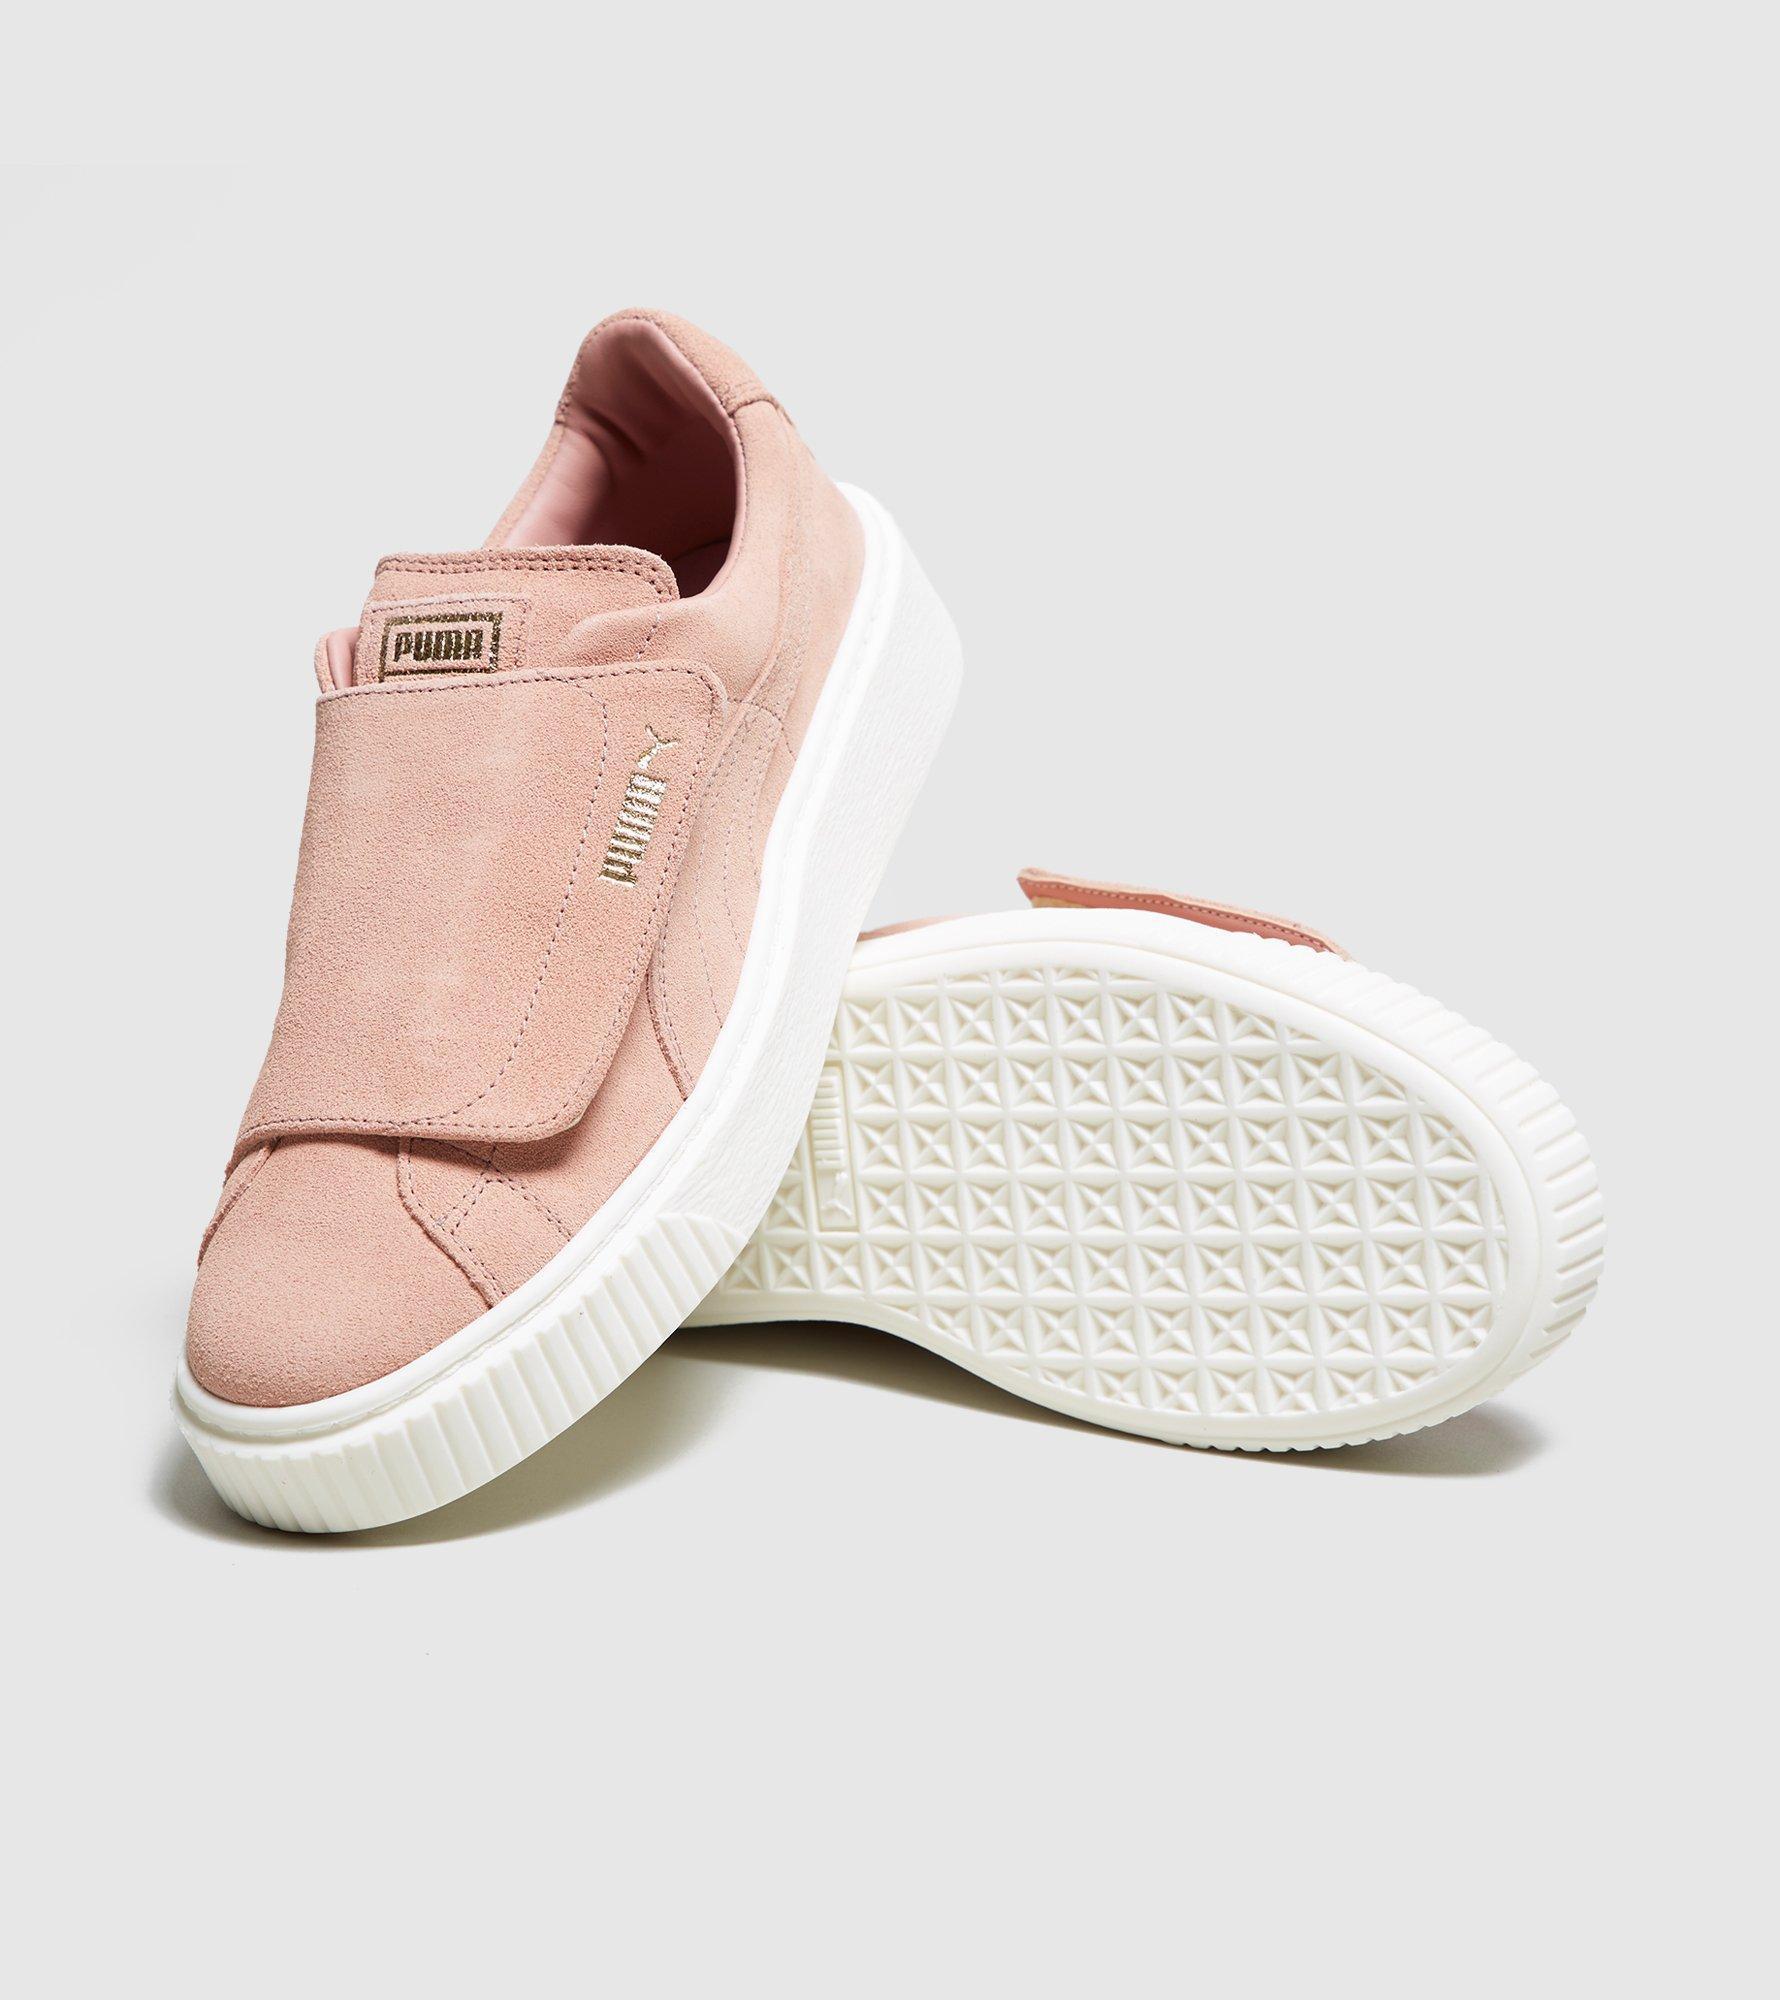 24b5530cafb PUMA Basket Platform Velcro Women's in Pink - Lyst